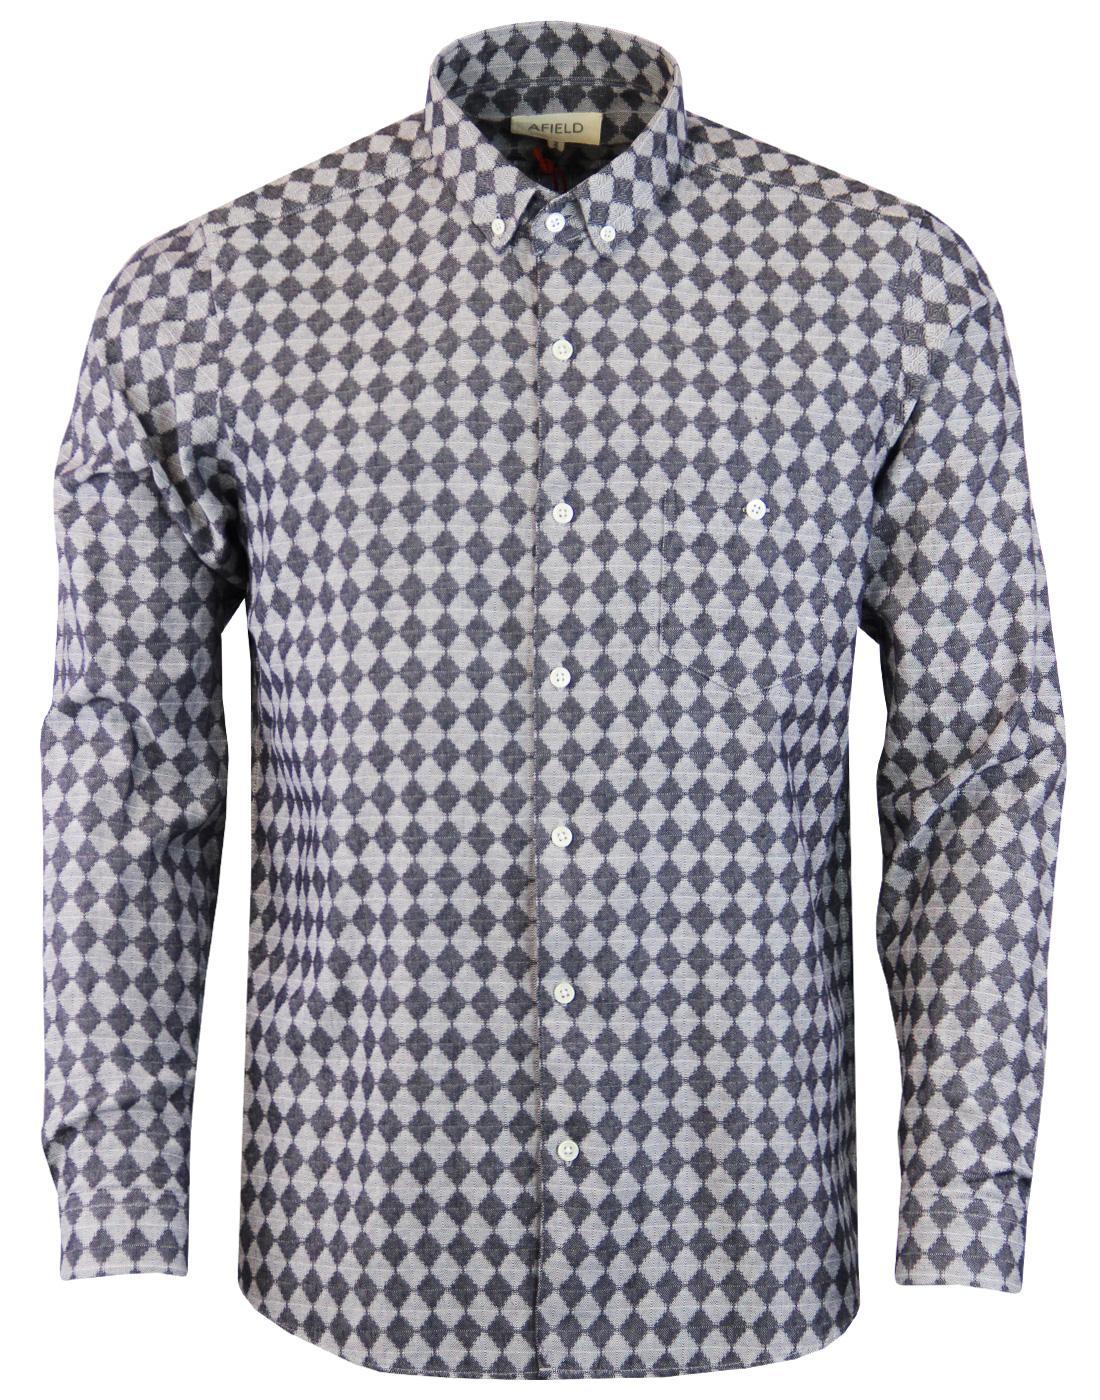 AFIELD Men's Retro Mod Op Art Triangle Check Shirt